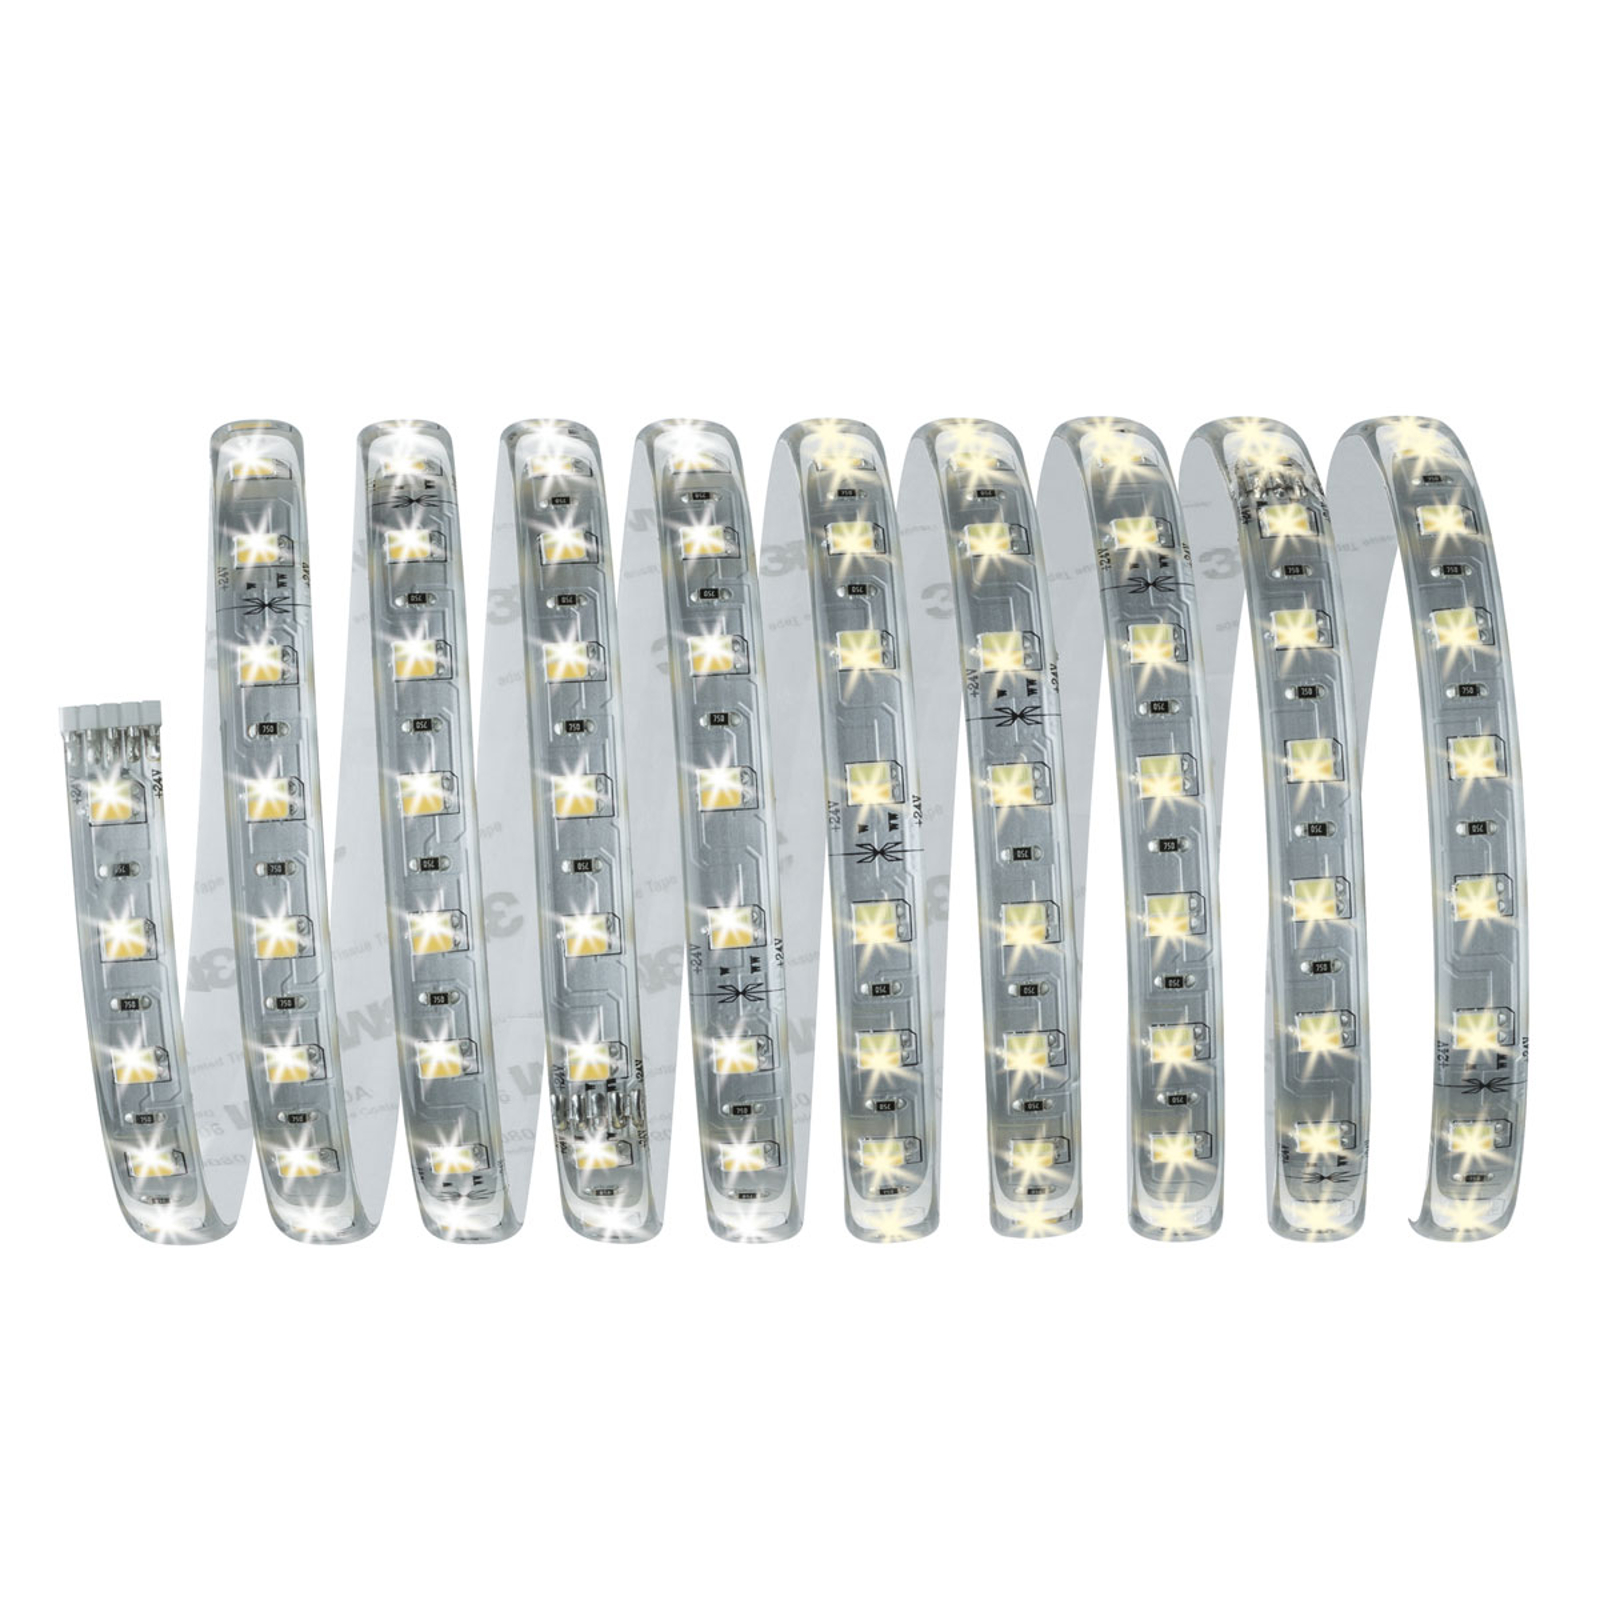 Set base strip LED Max 300 cm bianco, regolabile Illuminazione per interni